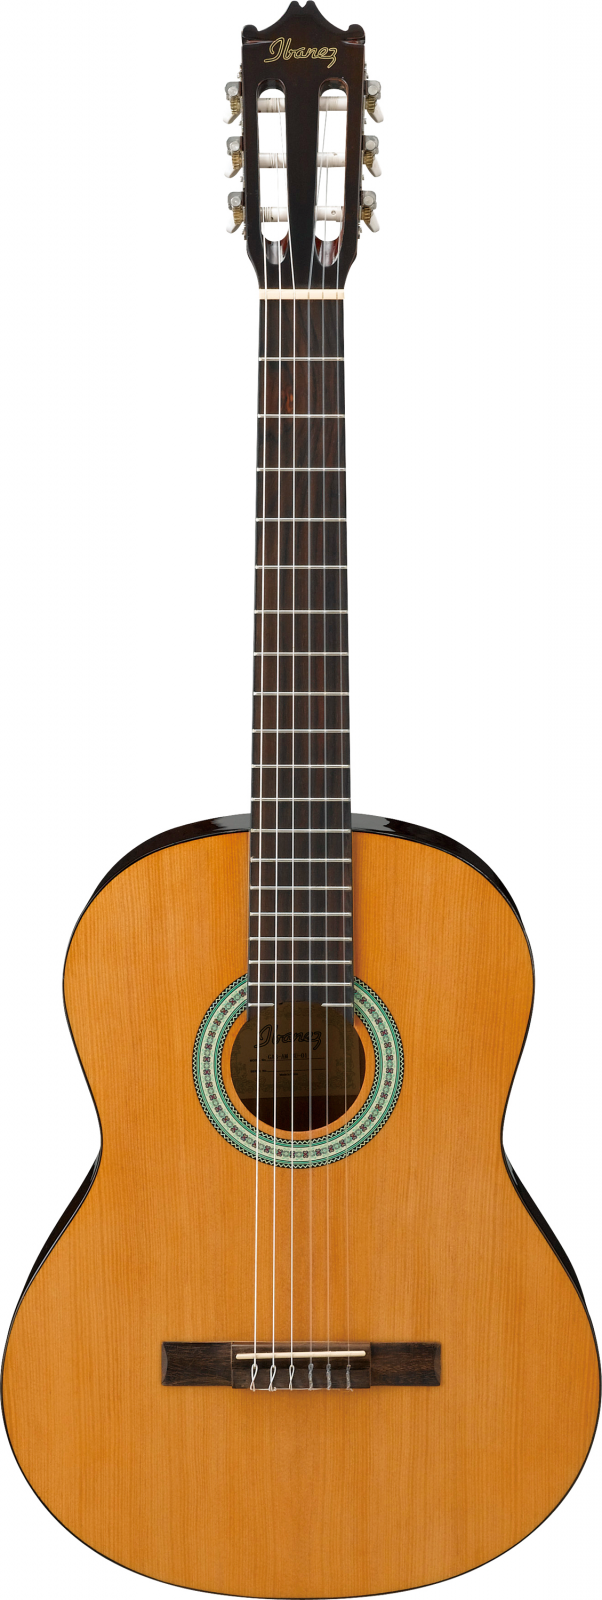 Ibanez Classical  GA3 6str Acoustic Guitar - Amber High Gloss